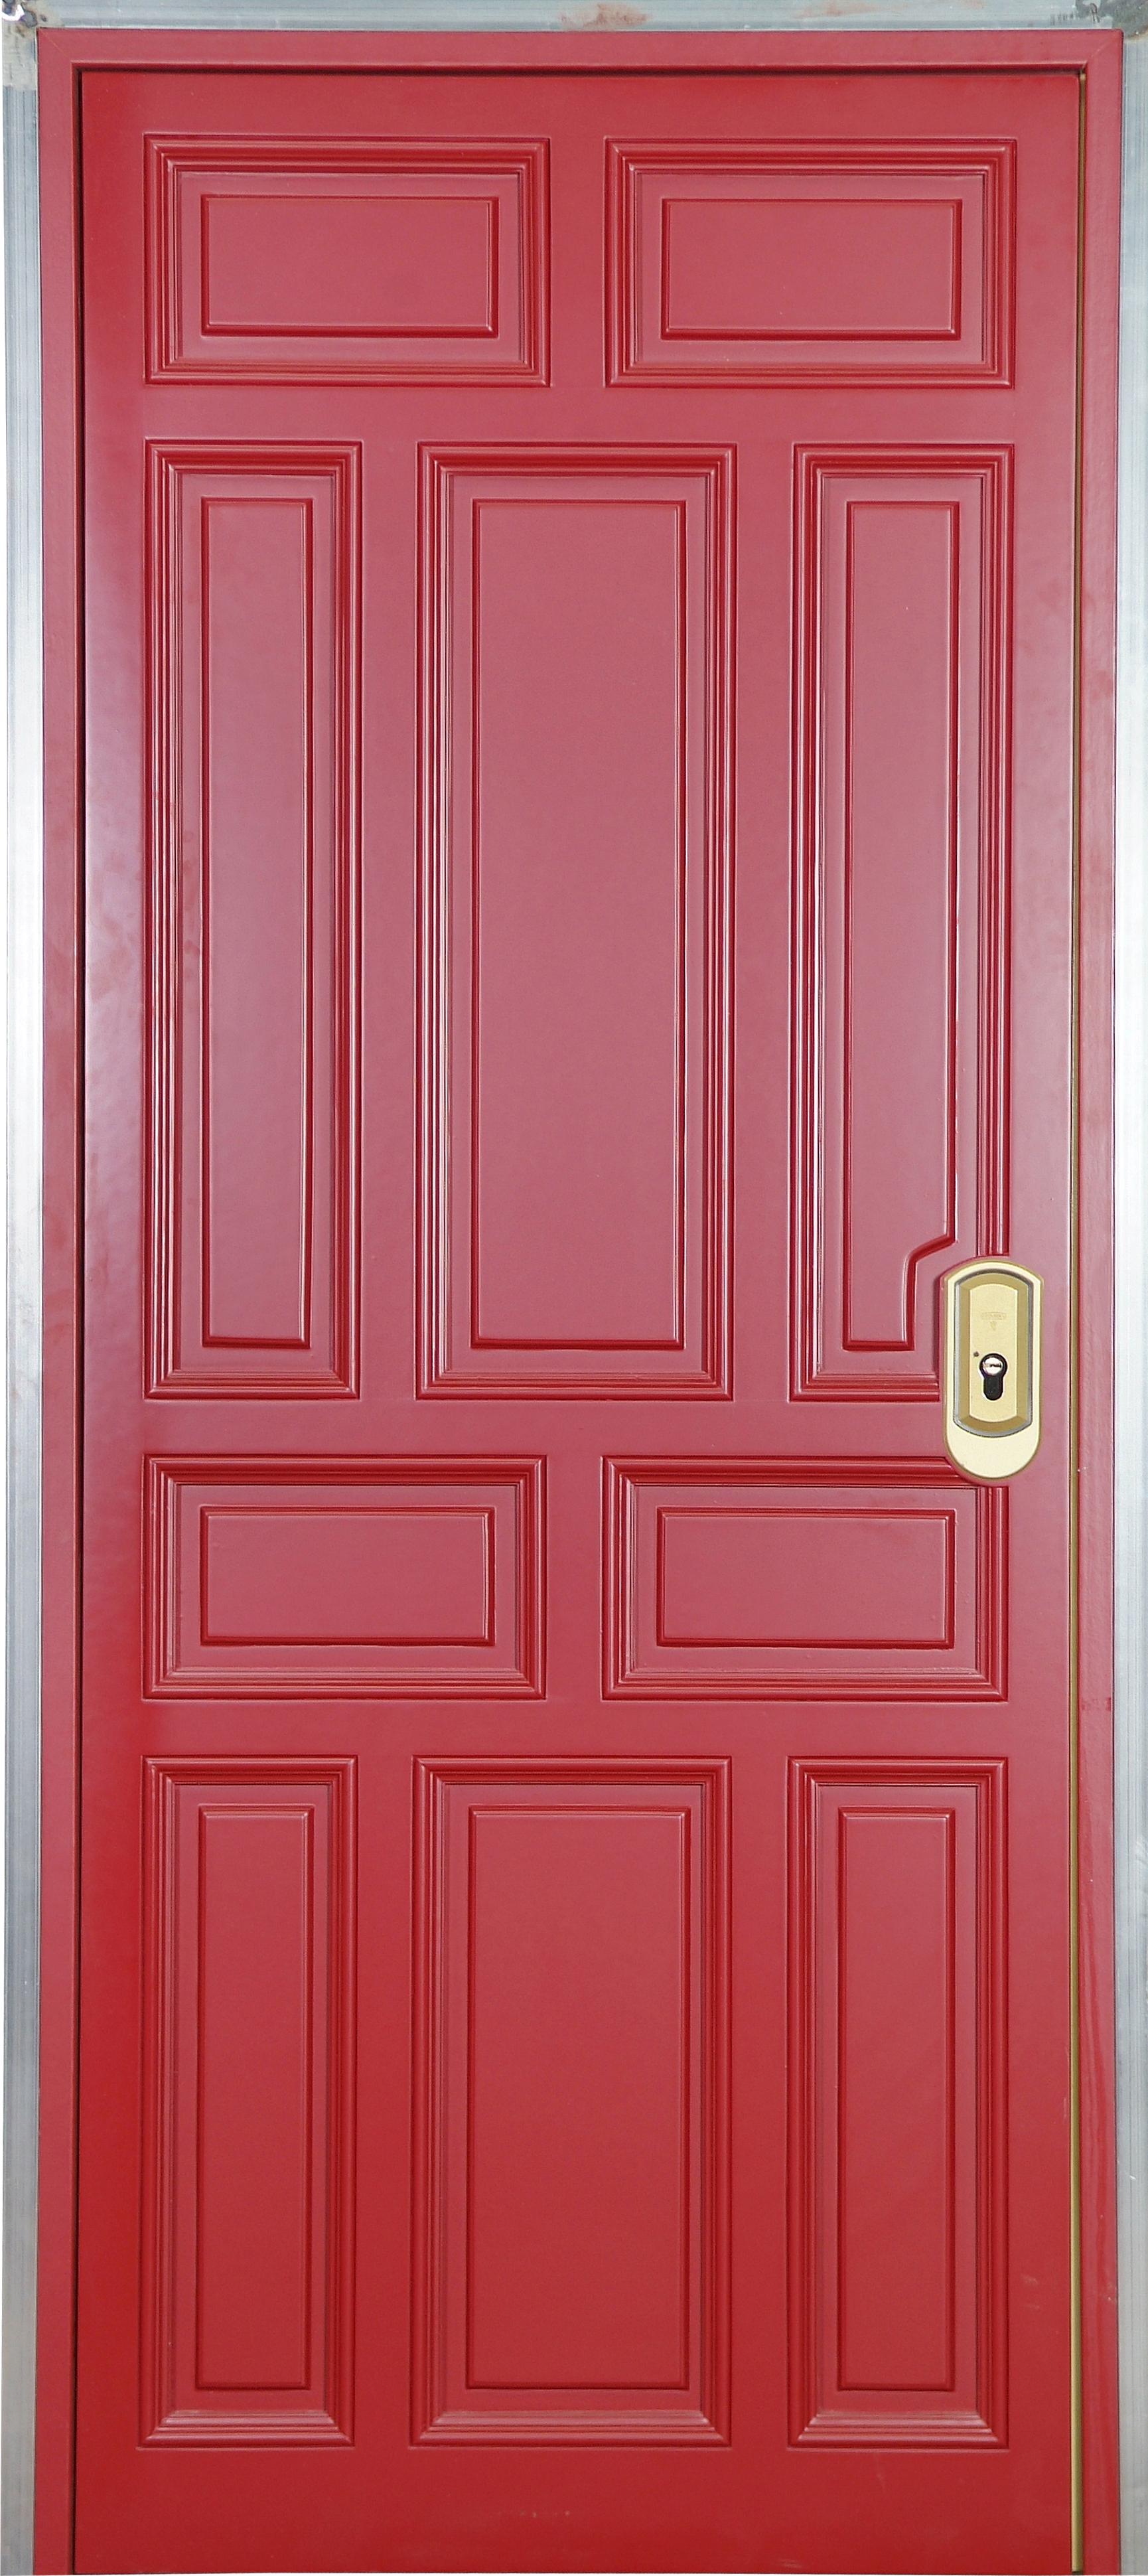 Mayorista de puertas blindadas - Puertas blindadas exterior ...